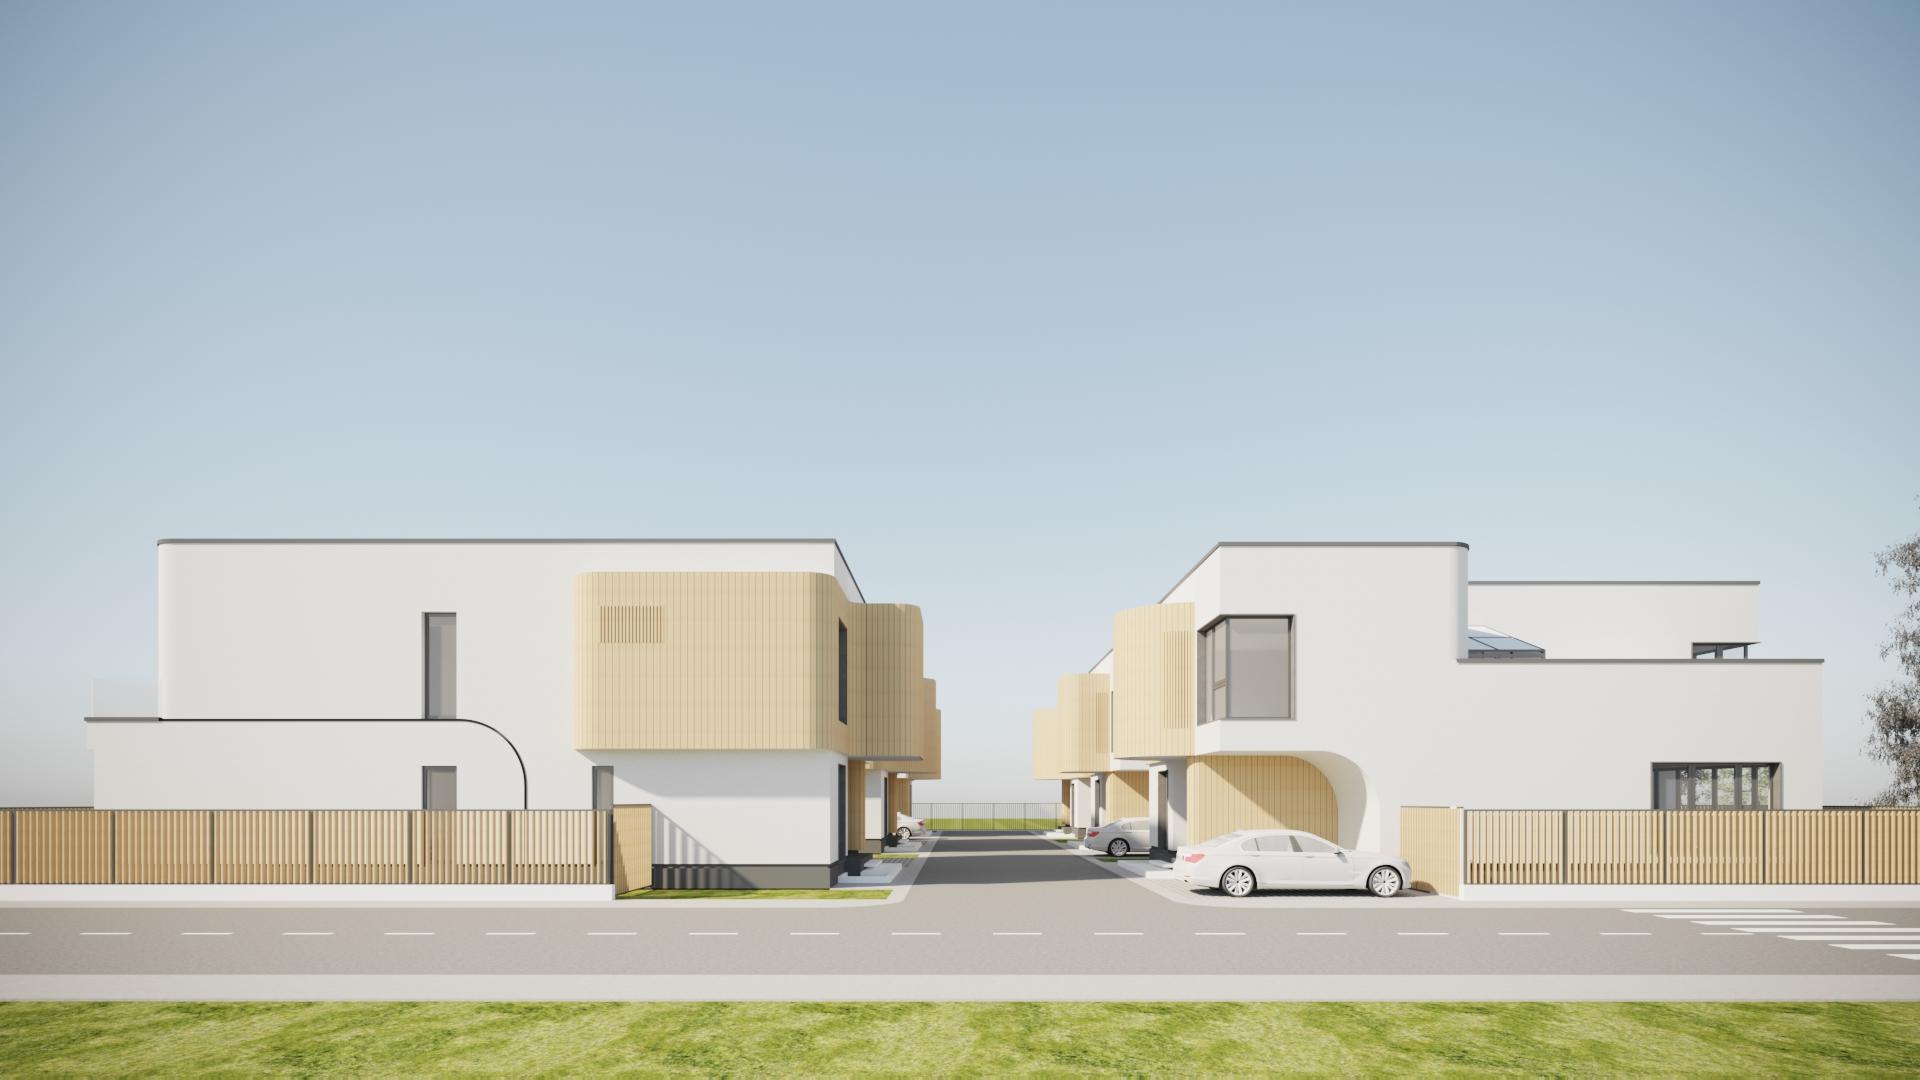 https://nbc-arhitect.ro/wp-content/uploads/2020/10/NBC-Arhitect-_-residential-_-Grand-Home-Residence-_-Romania_5.jpg